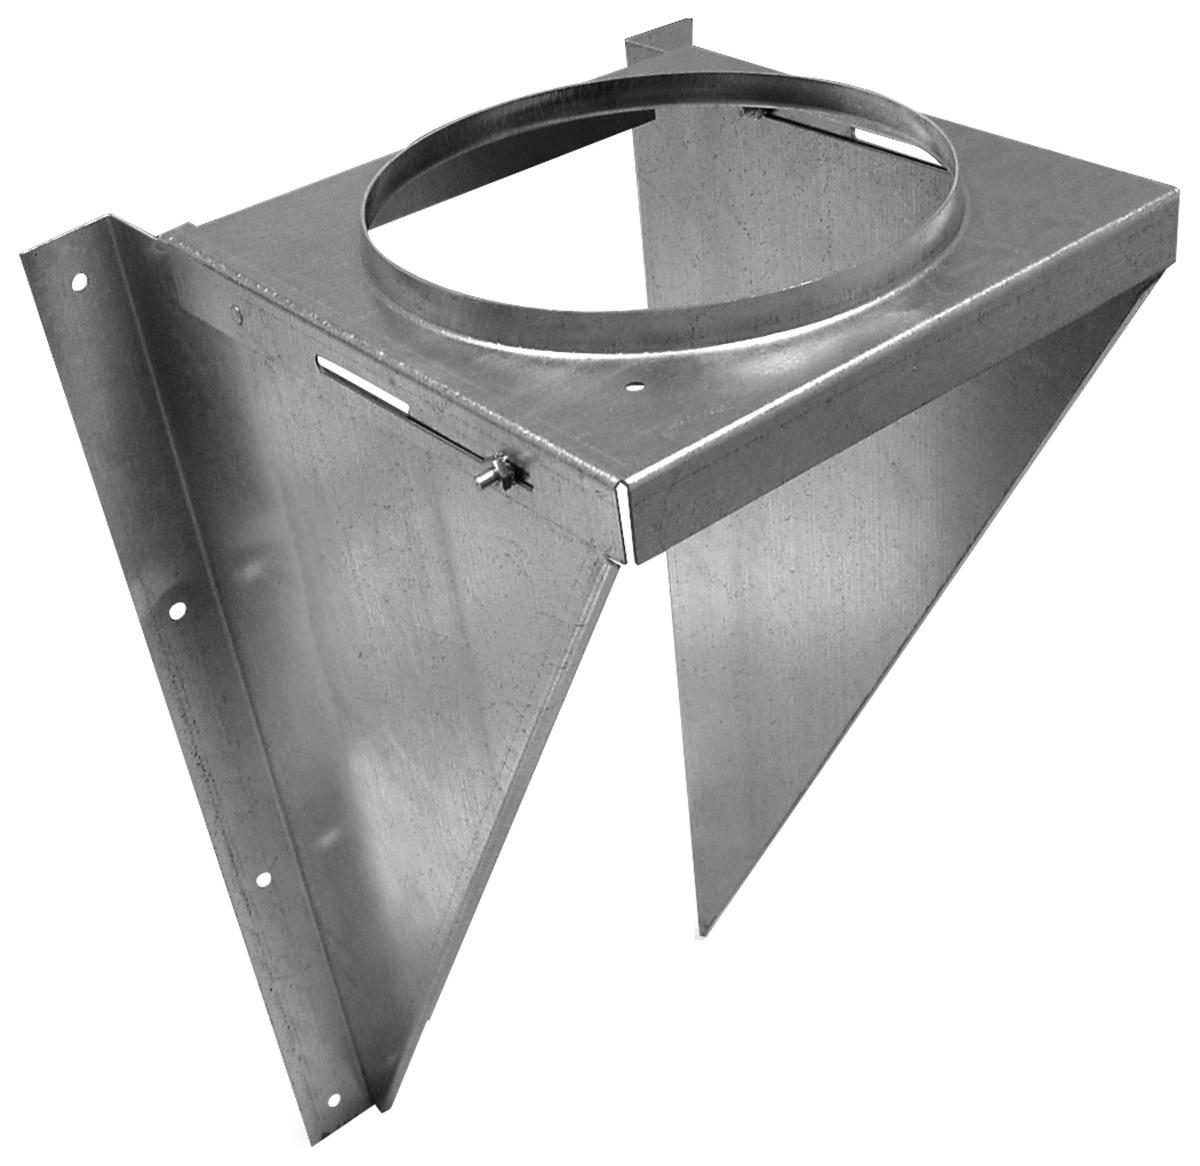 Tlciws Adjustable Intermediate Wall Support Hart Amp Cooley